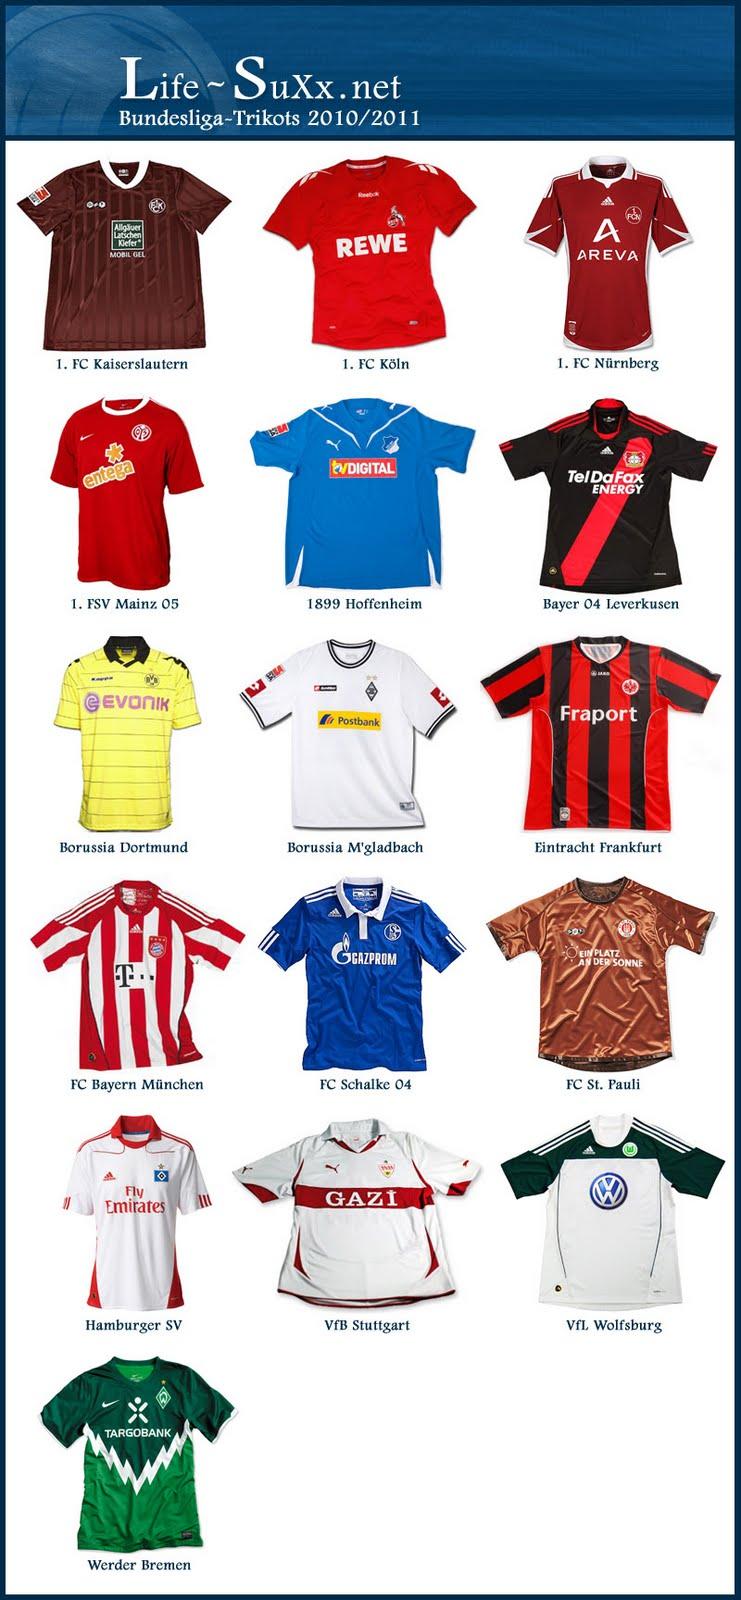 Life bundesliga trikots der saison 2010 2011 for Bundesliga trikots